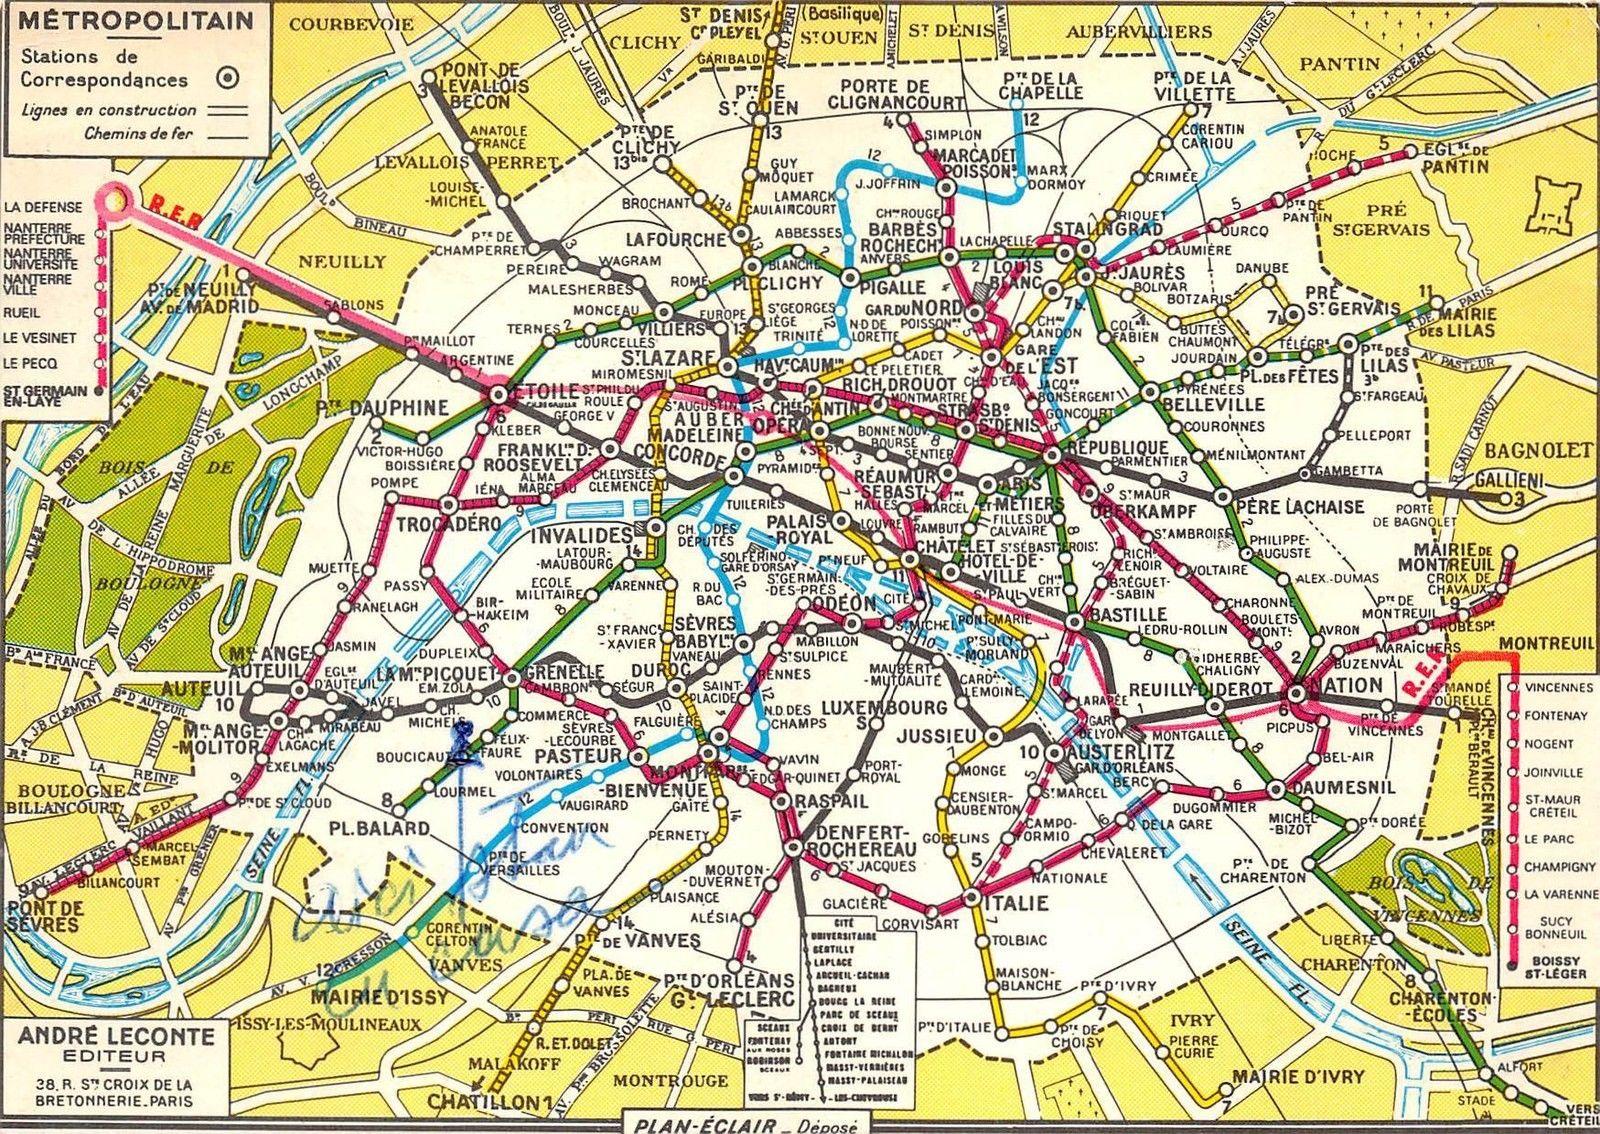 Cartina Metro Di Parigi.Metropolitana Di Parigi Metroricerche Blog